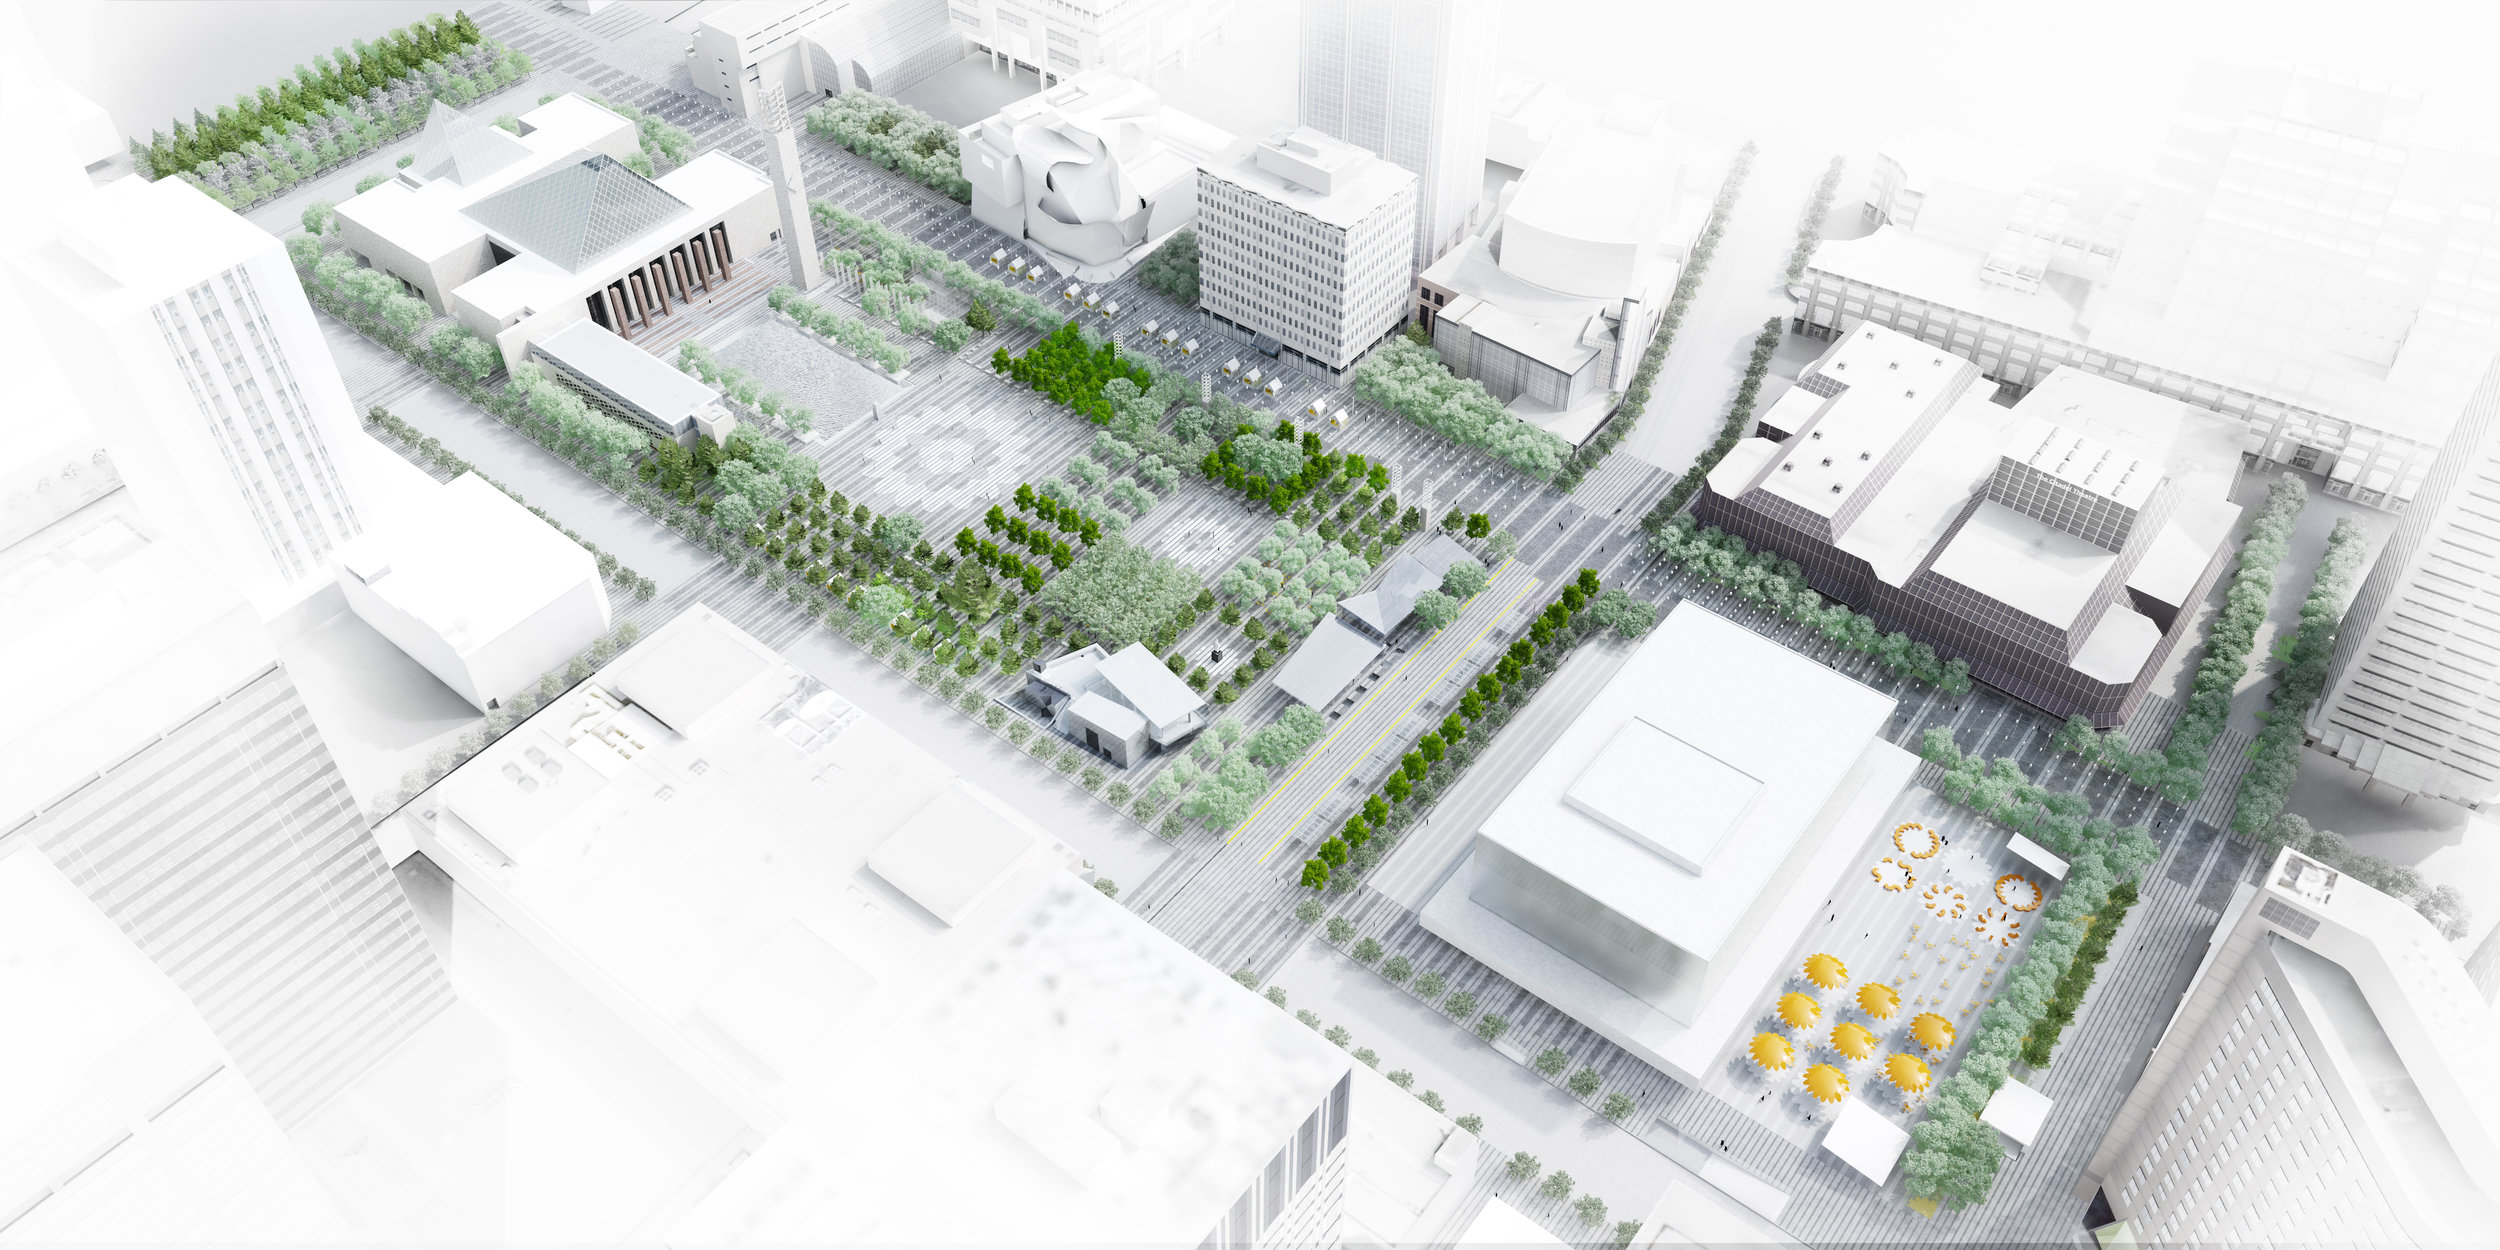 Edmonton Civic Precinct Master Plan -